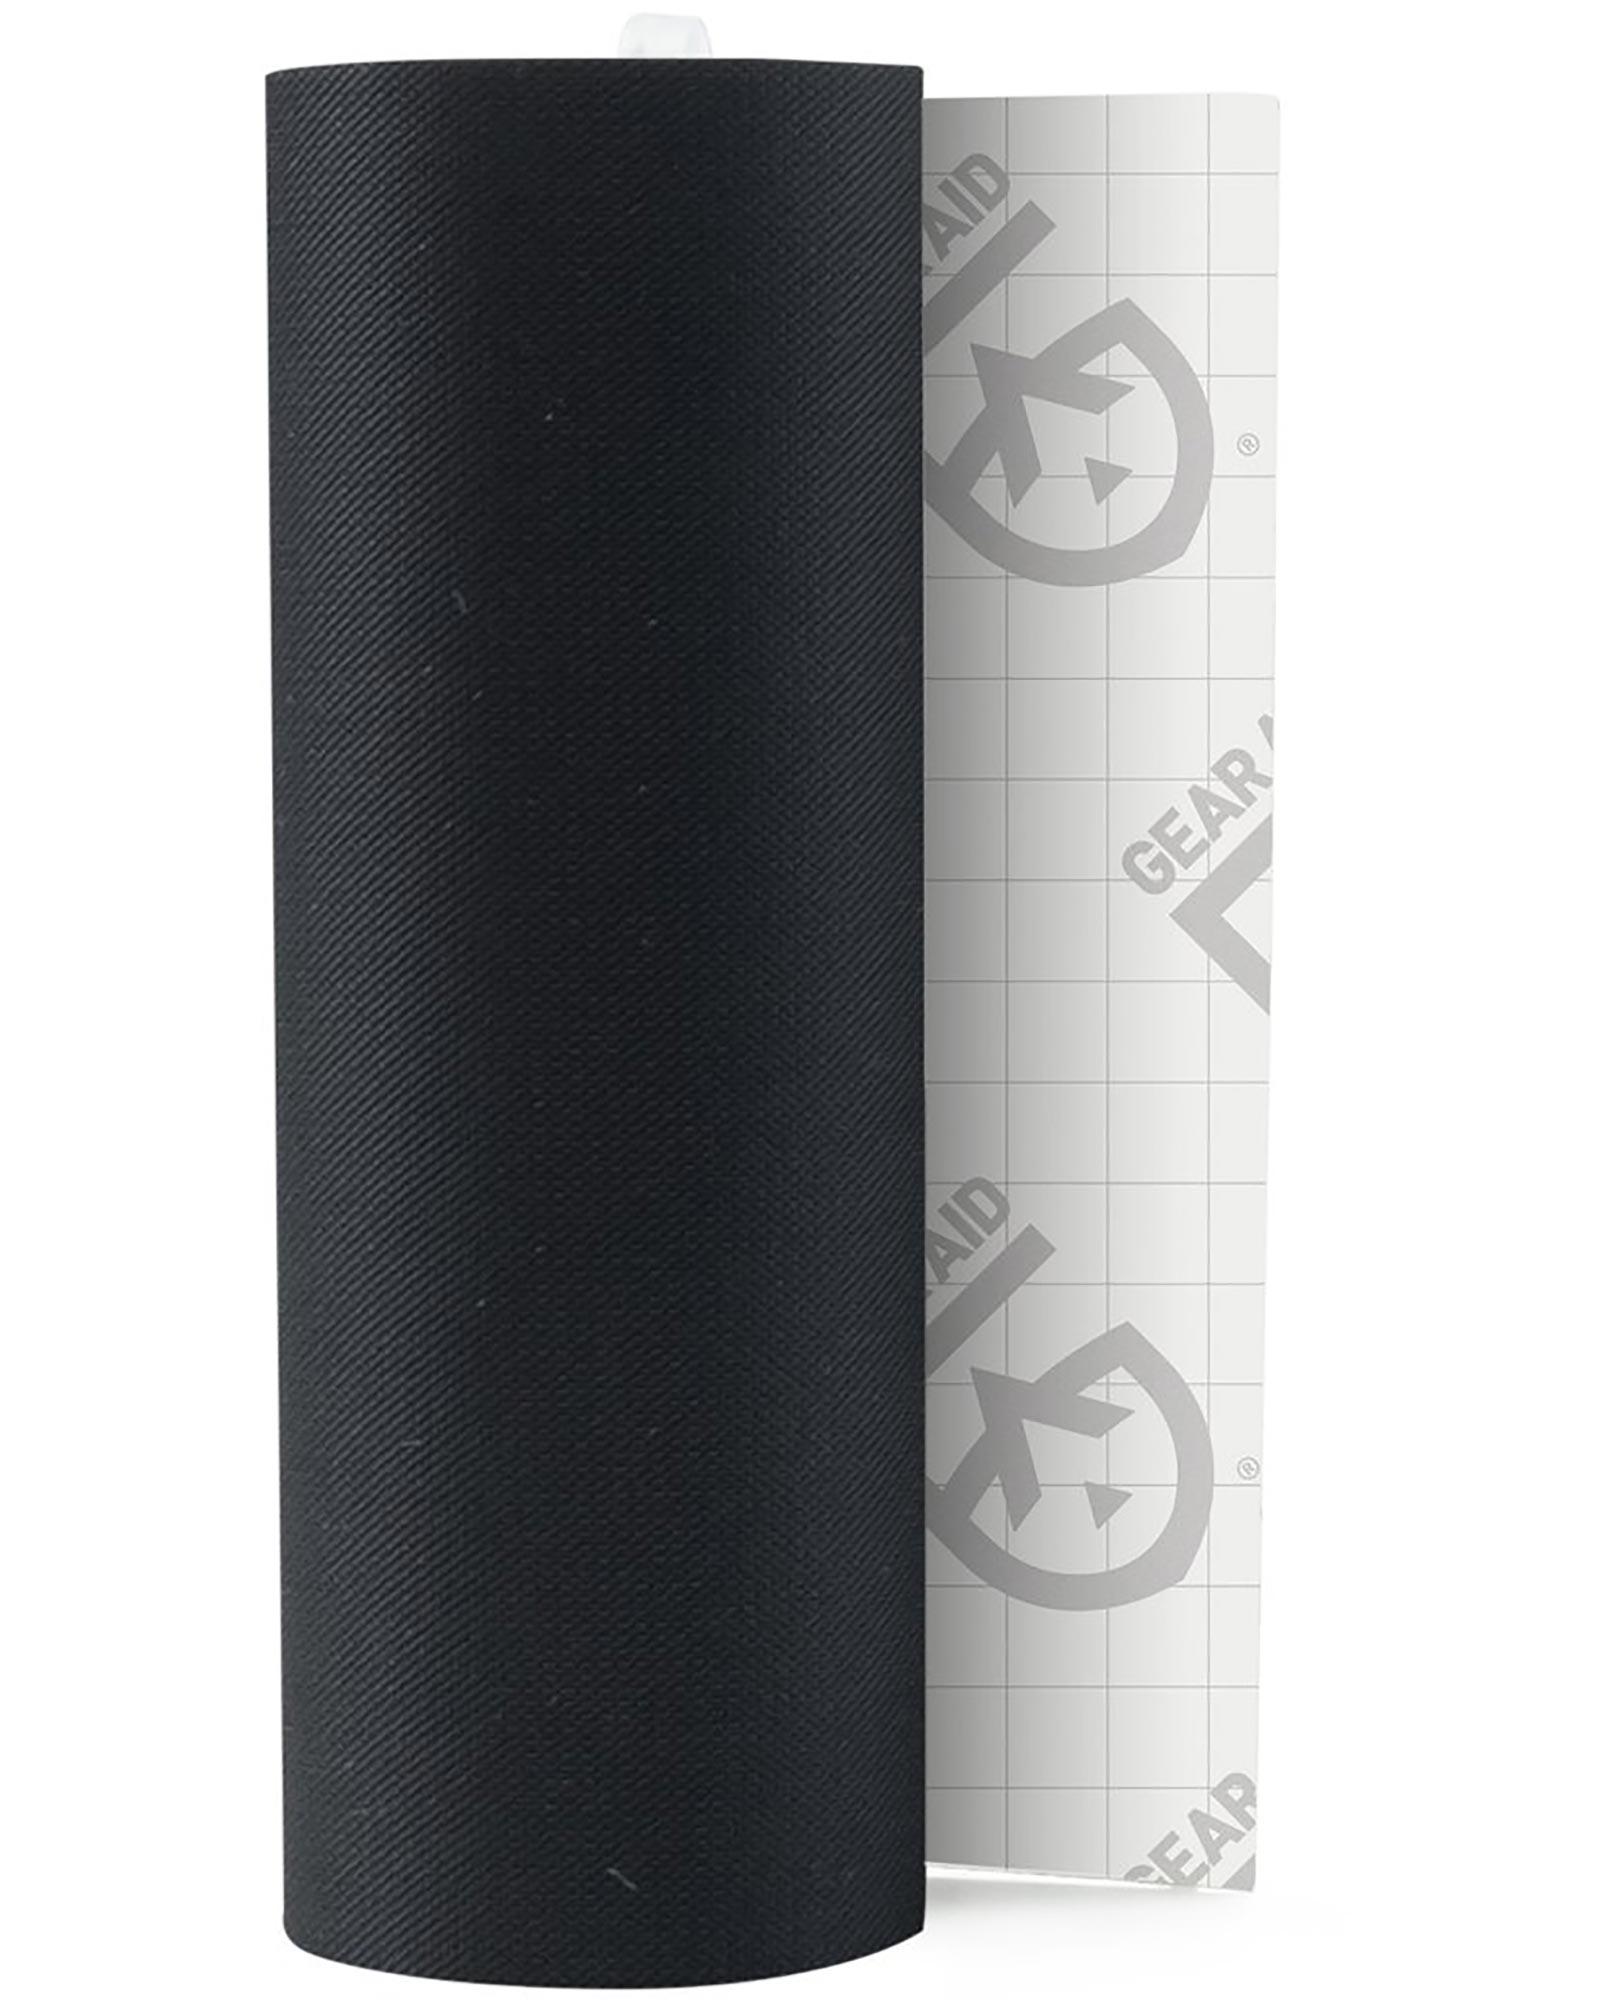 Gear Aid Tenacious Repair Tape 0